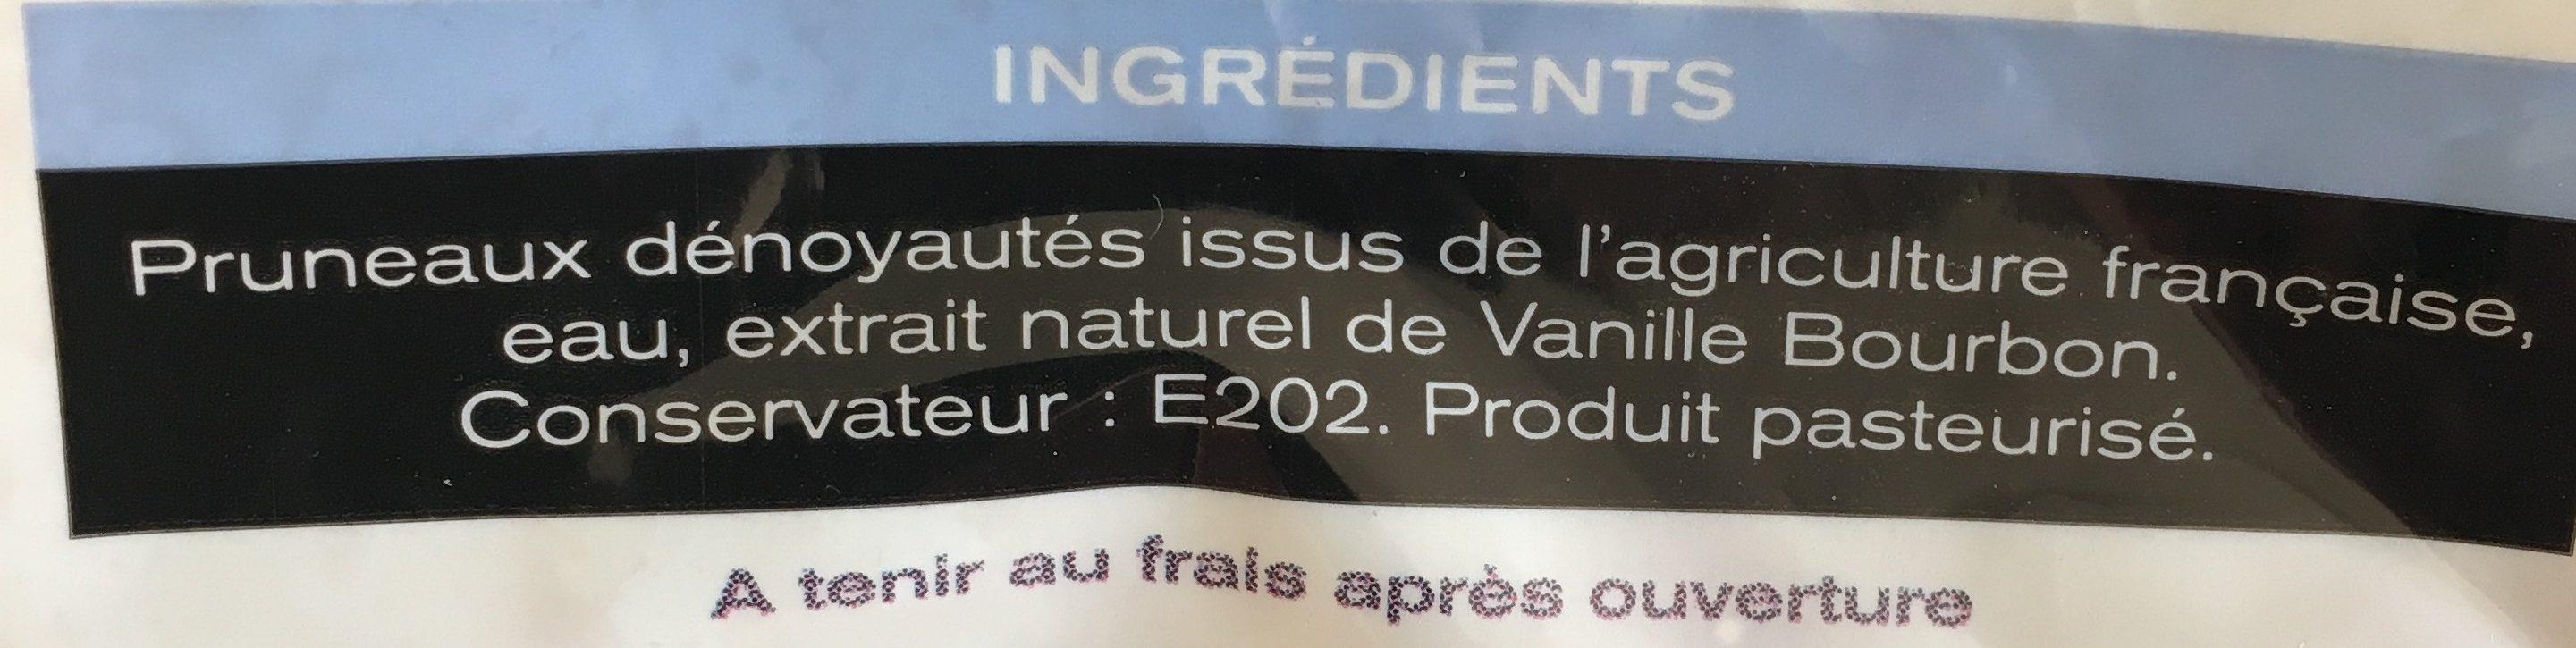 Pruneaux denoyautés - Ingrediënten